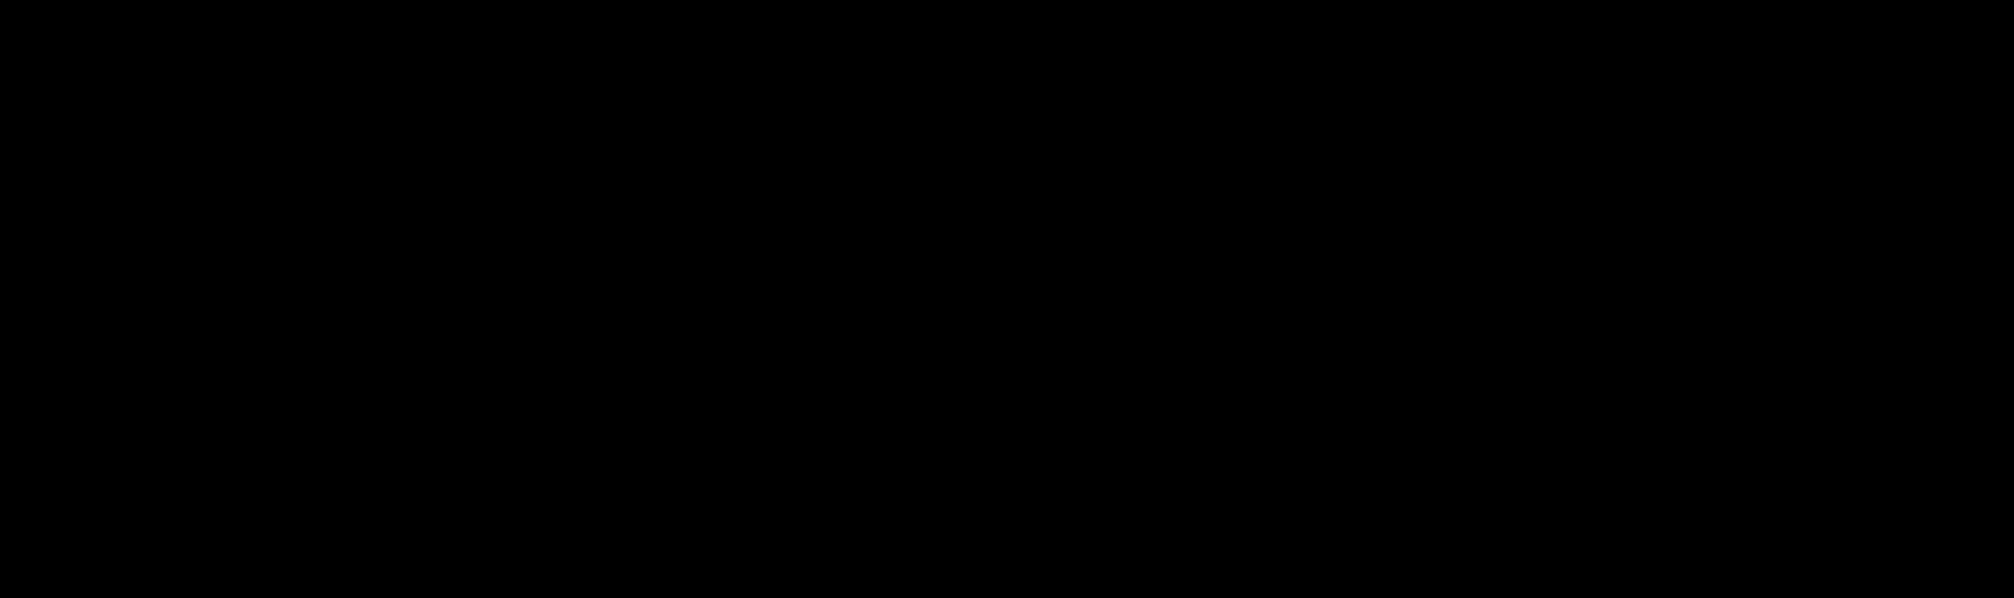 Moupinamide-d<sub>3</sub>